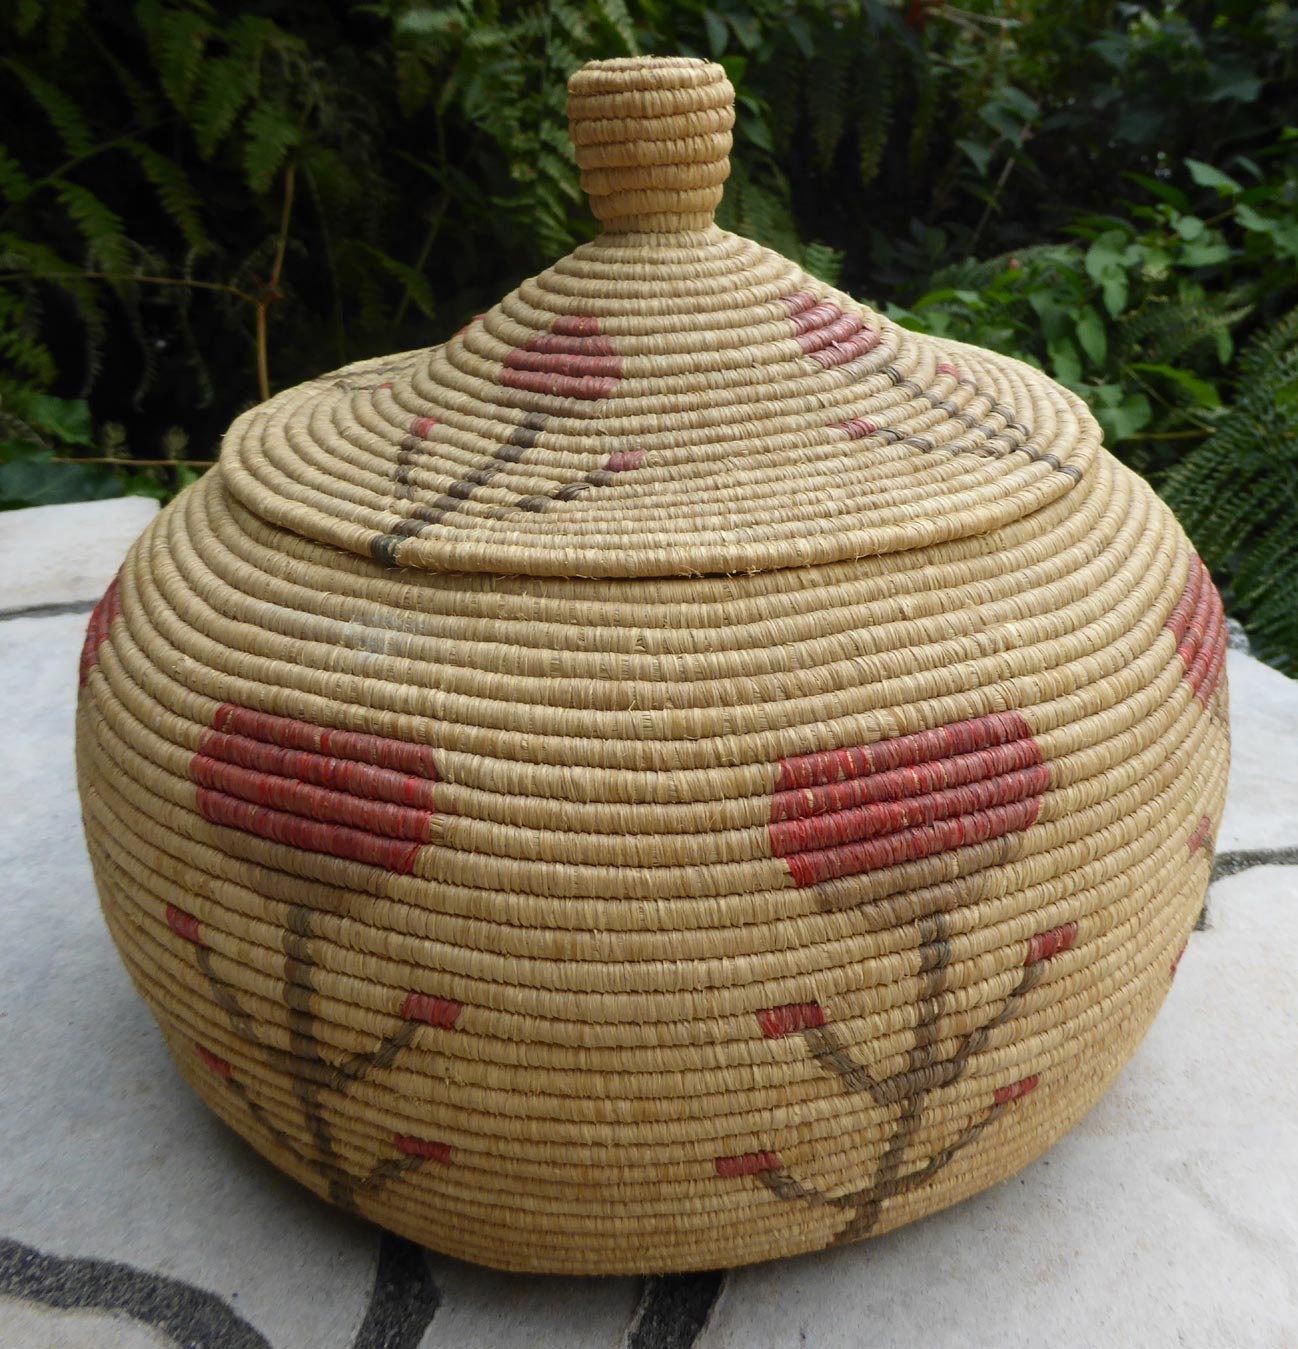 Native American Alaskan Eskimo Yupik Basket ⋆ Copper